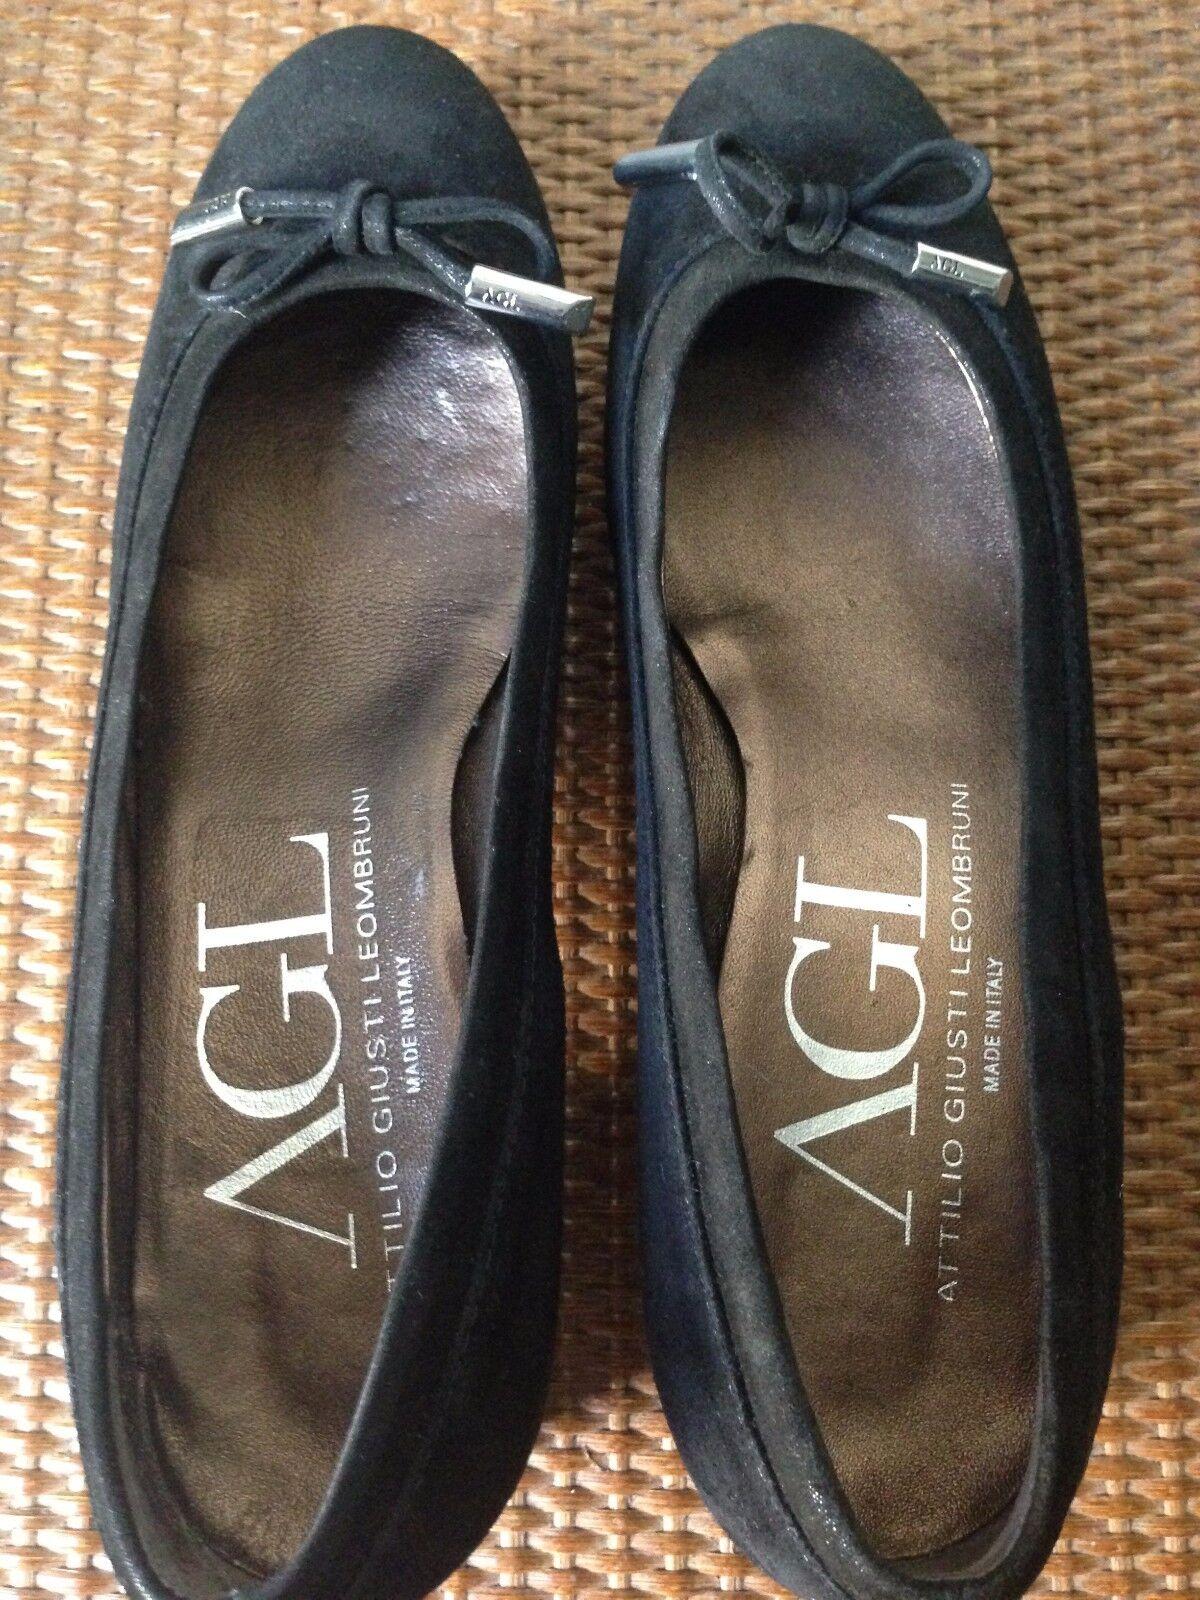 NEW Black Suede Block Heel Woman's Shoes Size 36.5